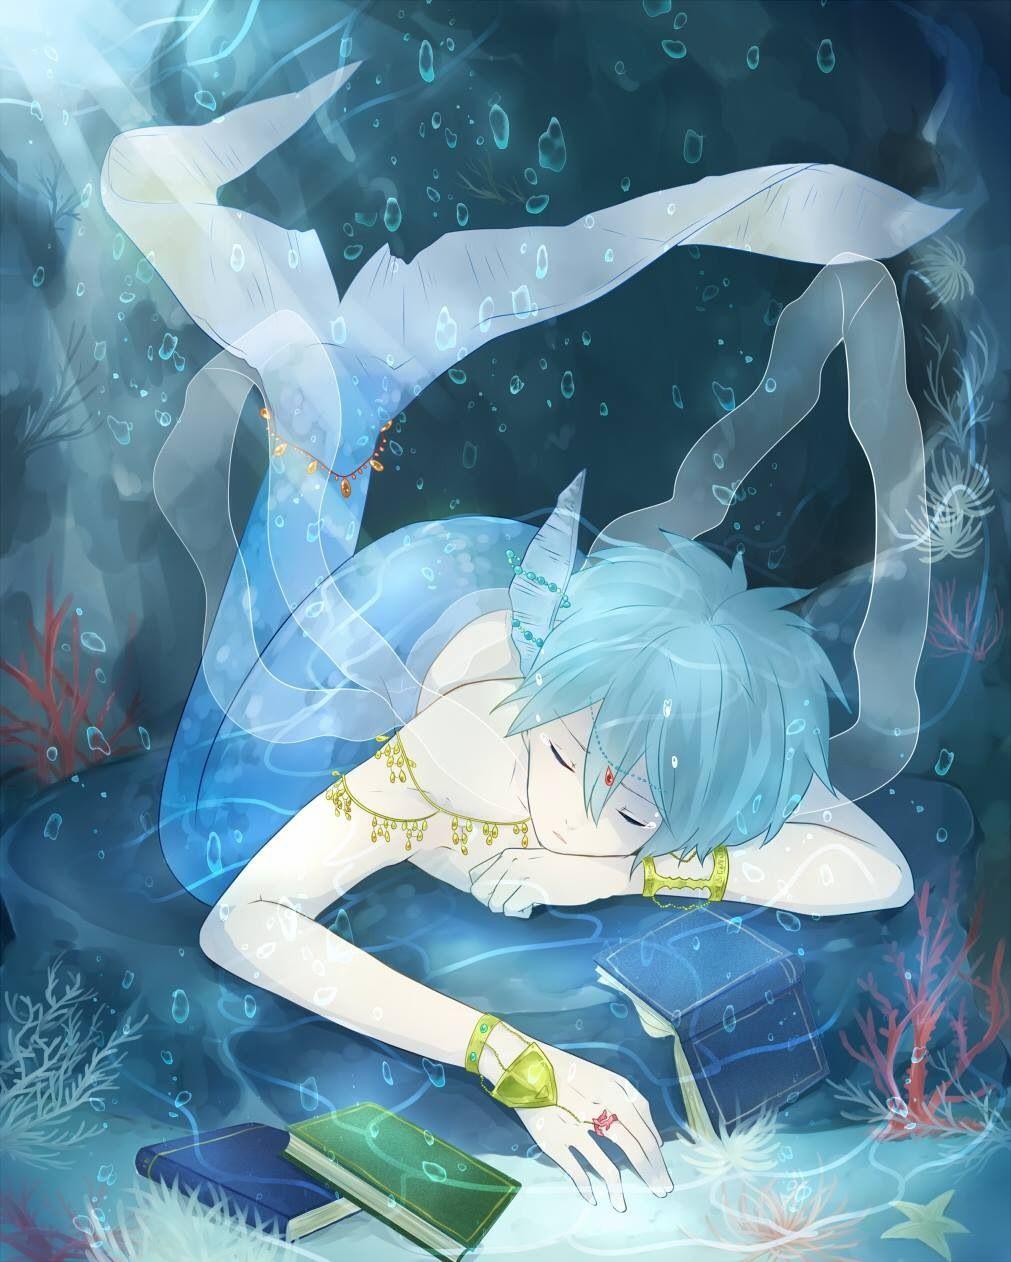 Pin by alessandra🌸 on Toons  Anime mermaid, Anime merman, Anime